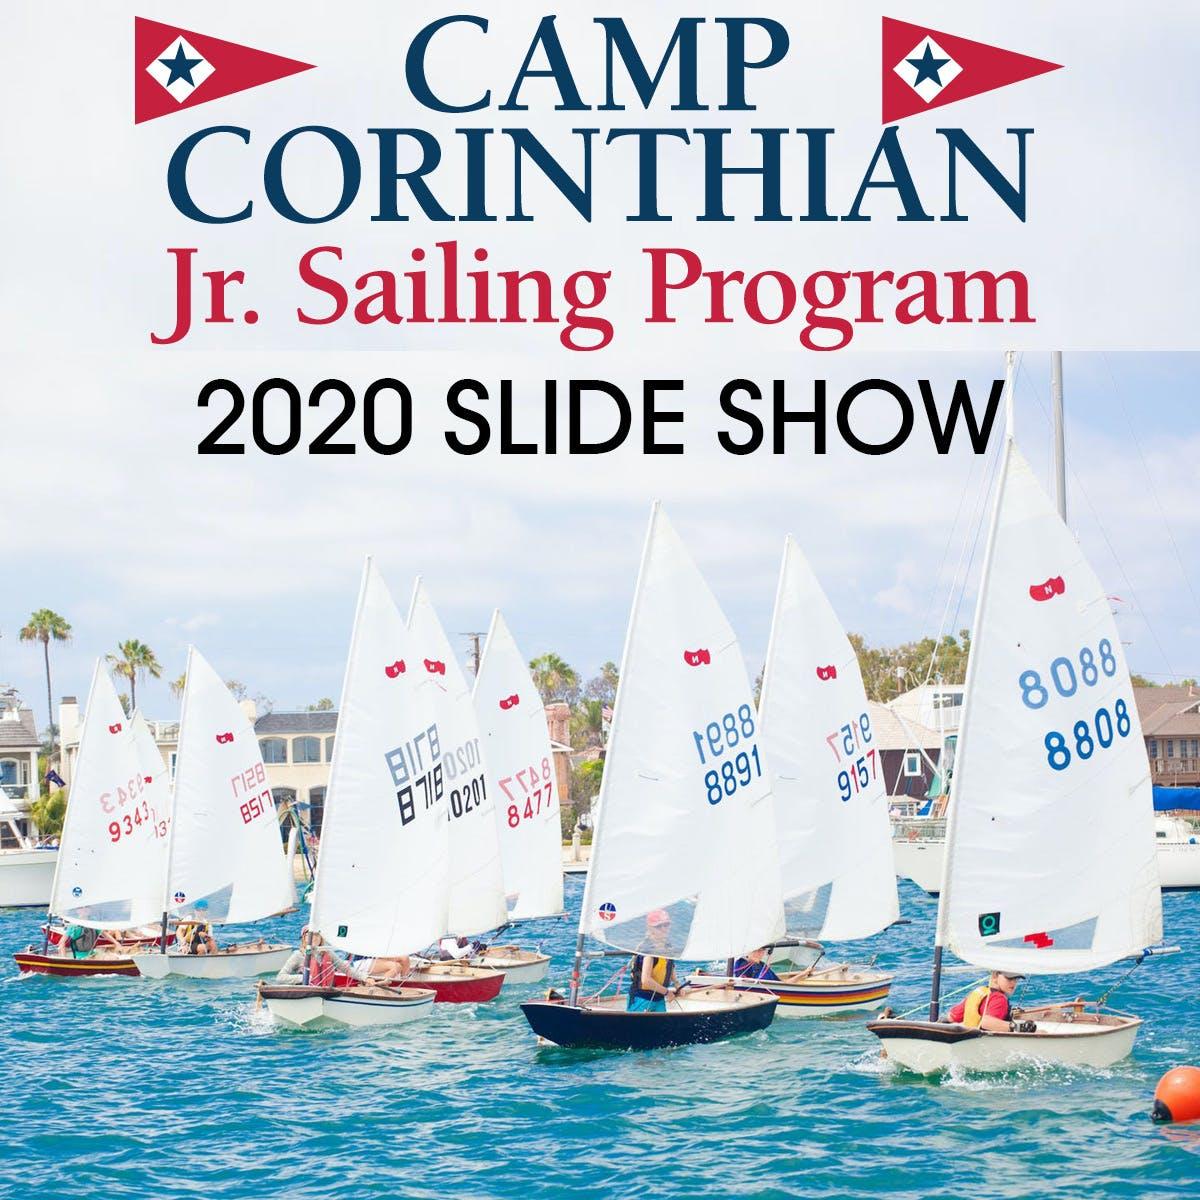 Camp Corinthian Slide Show